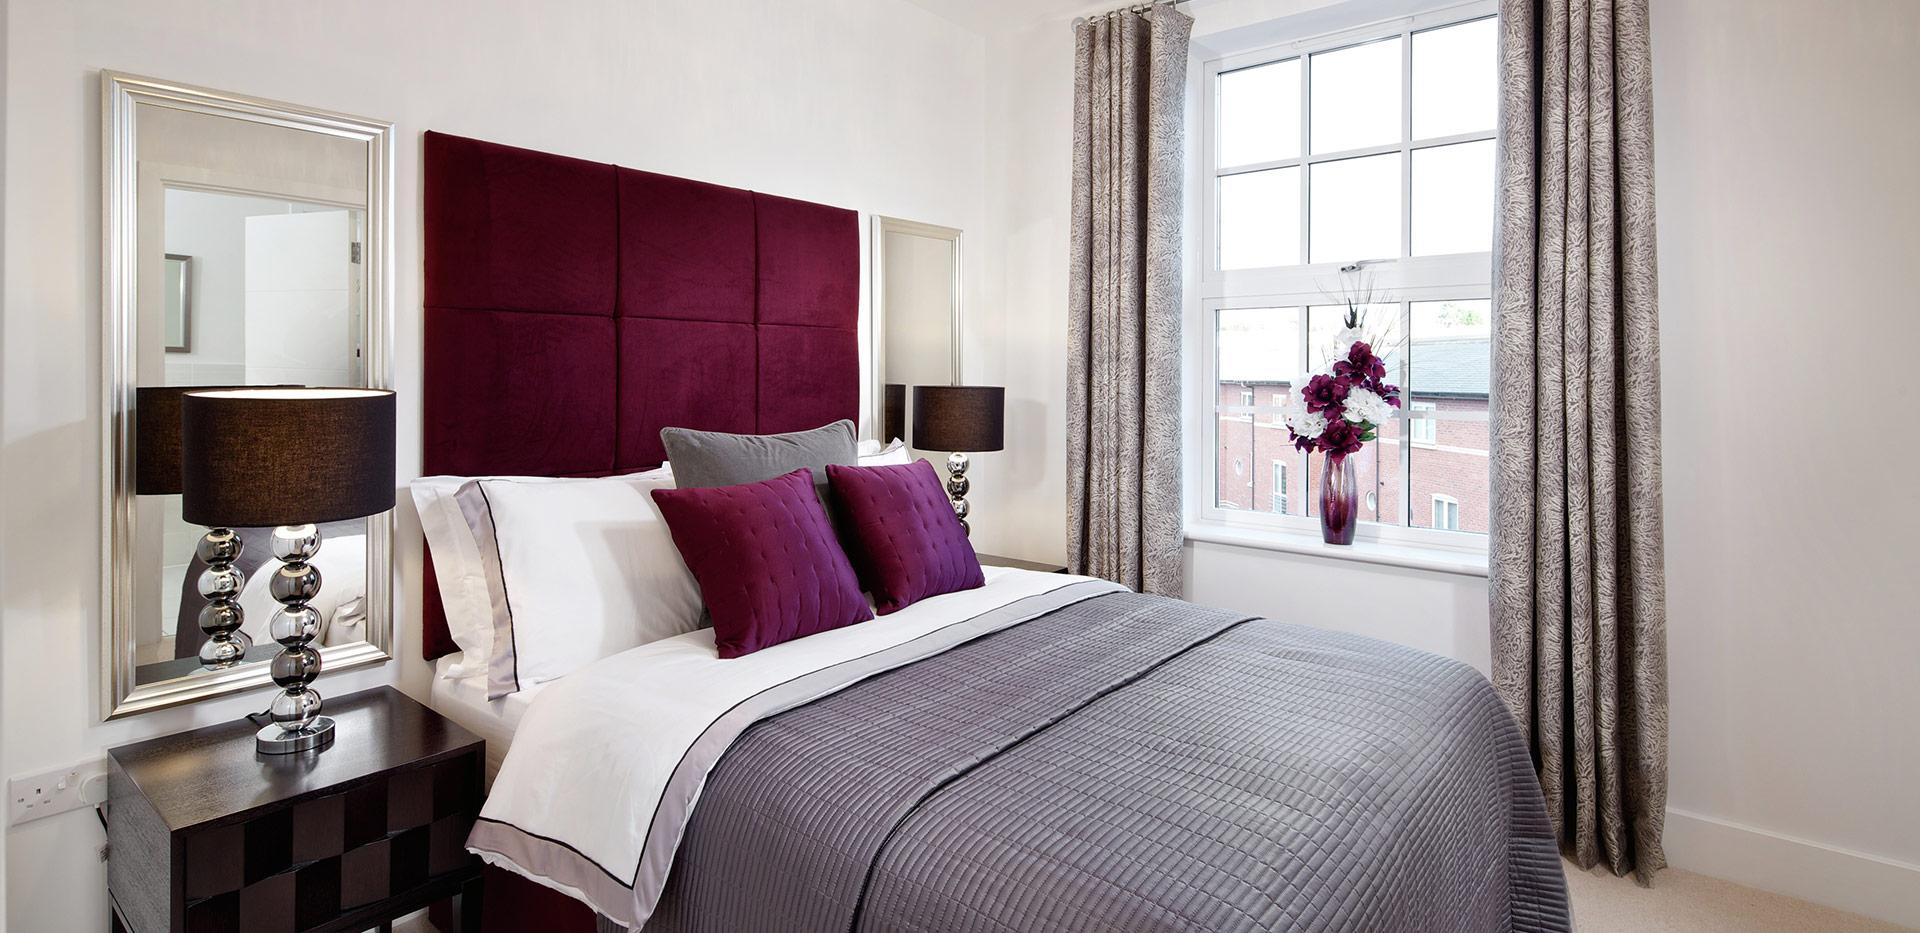 Berkeley, The Waterside at Royal Worcester, Interior, Bedroom, Plot 557